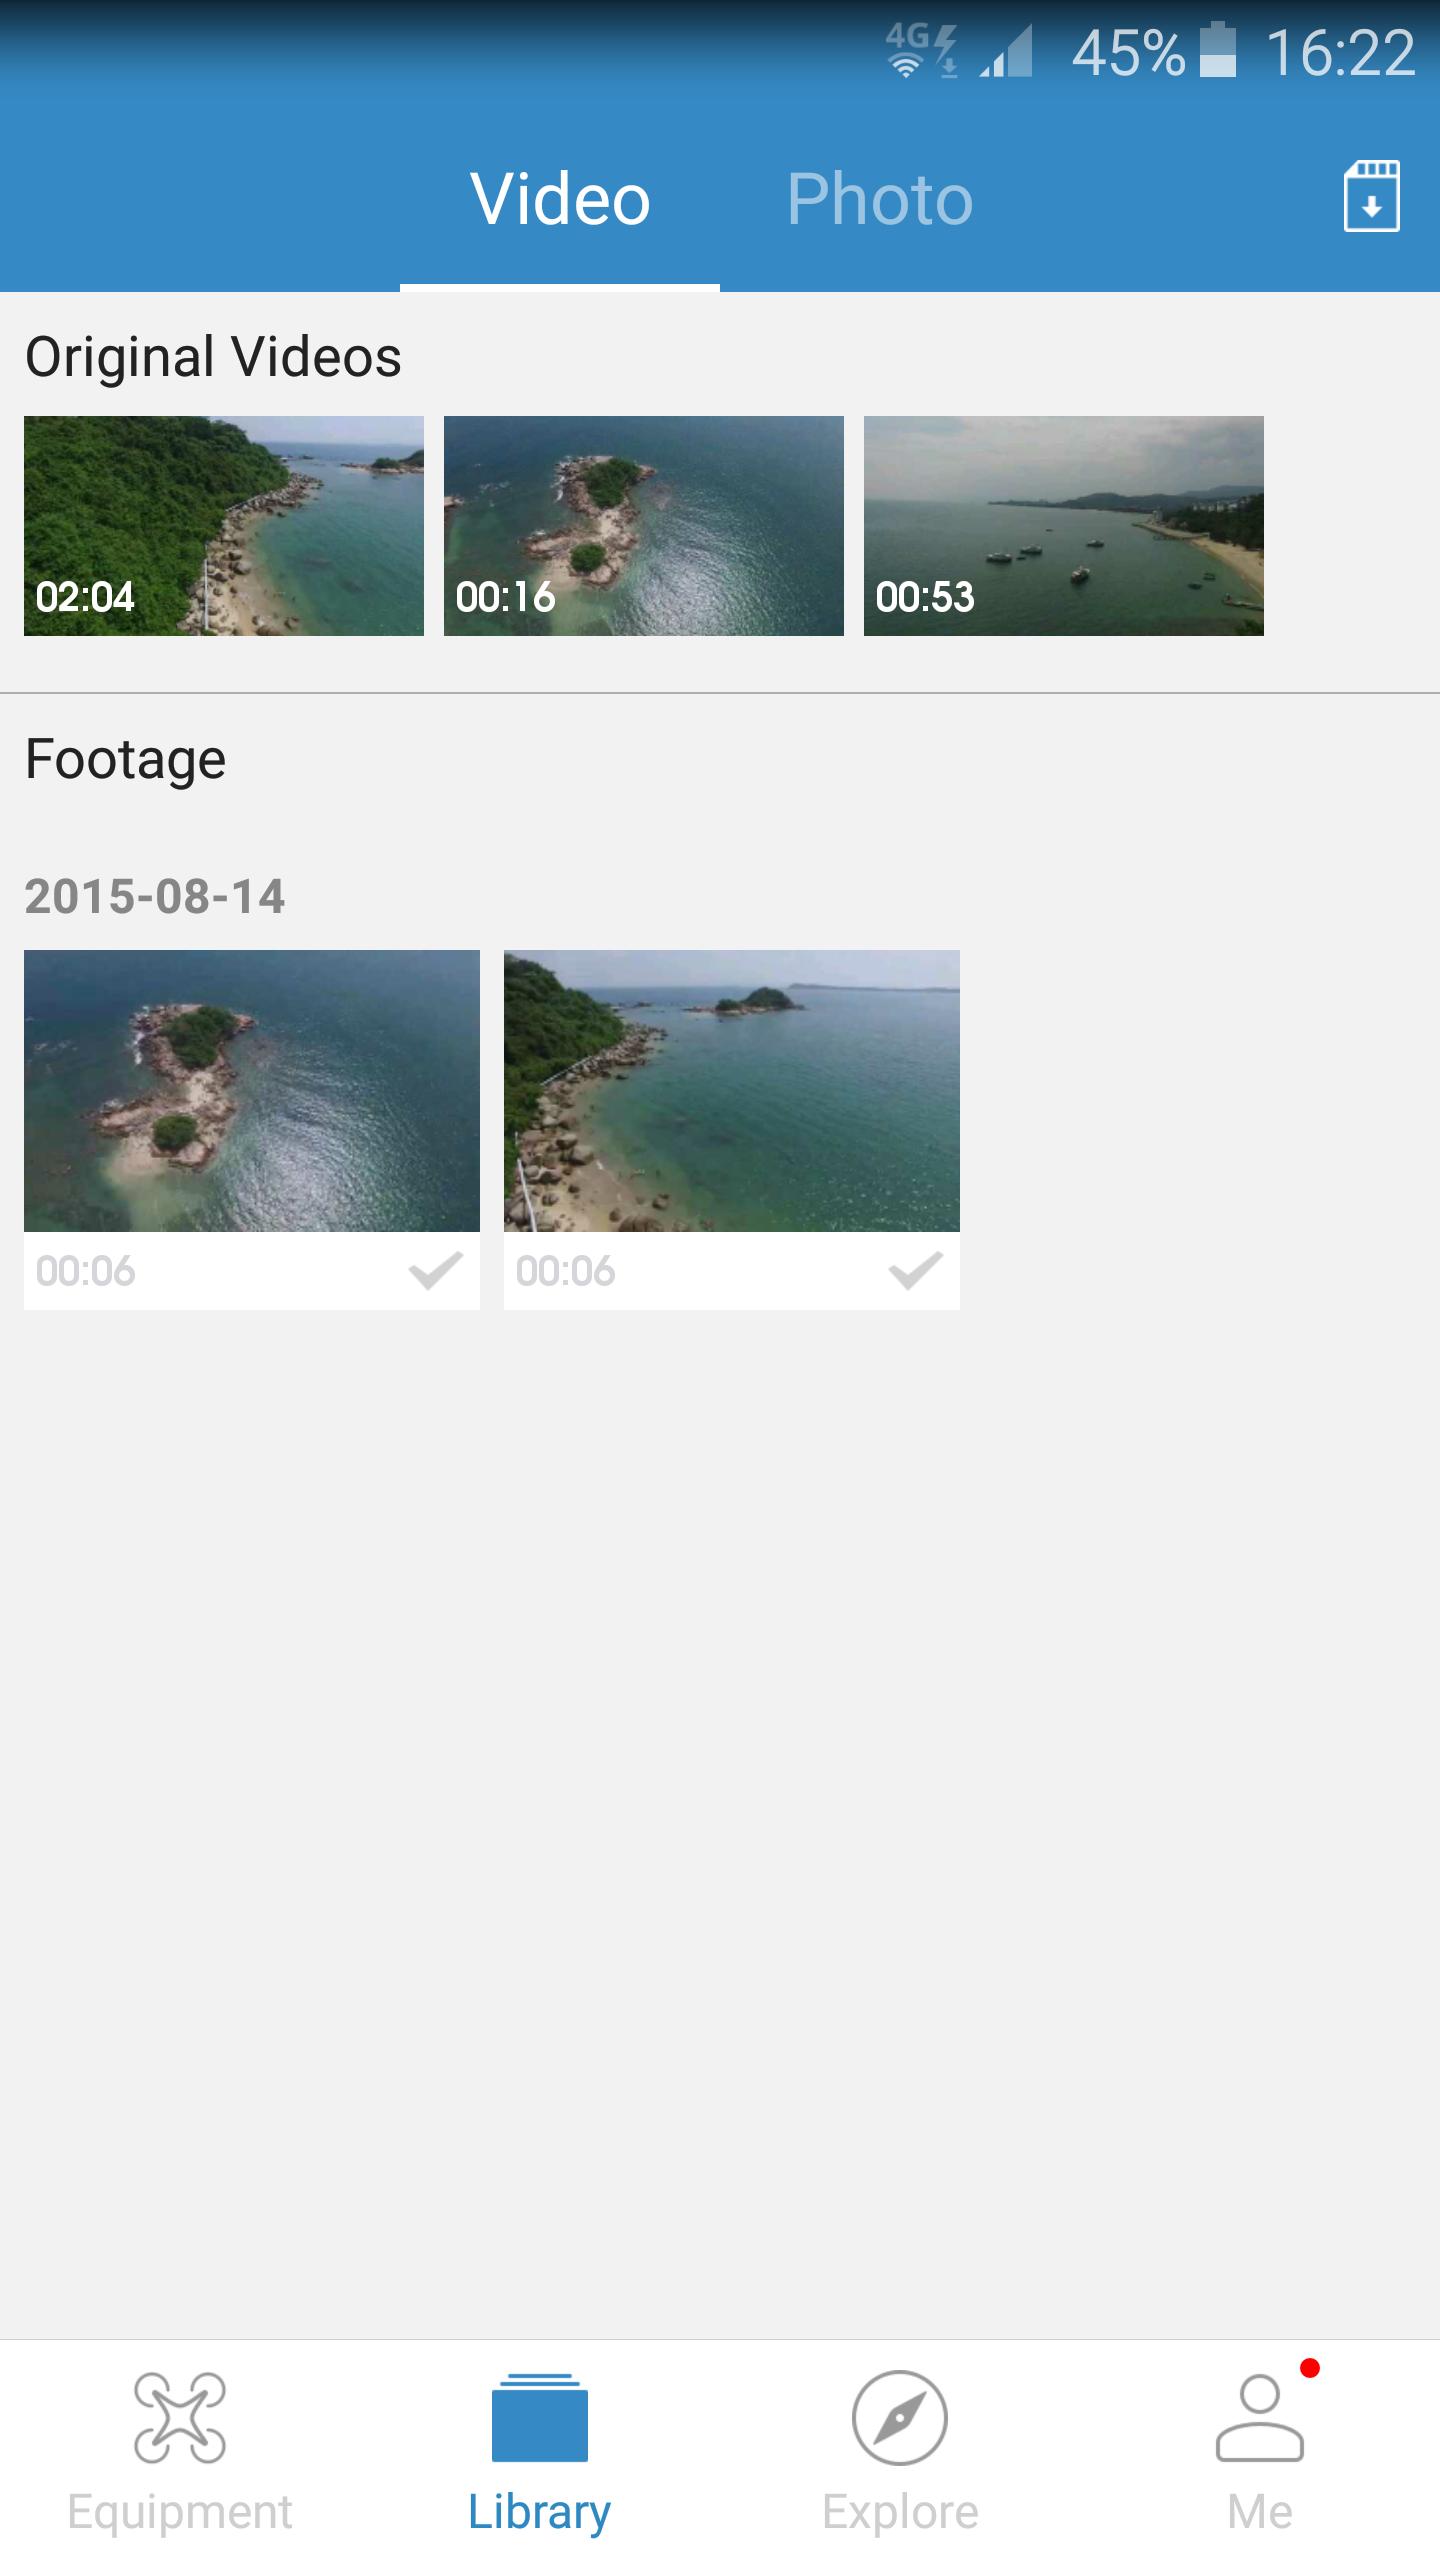 Screenshot_2015-08-17-16-22-34.png